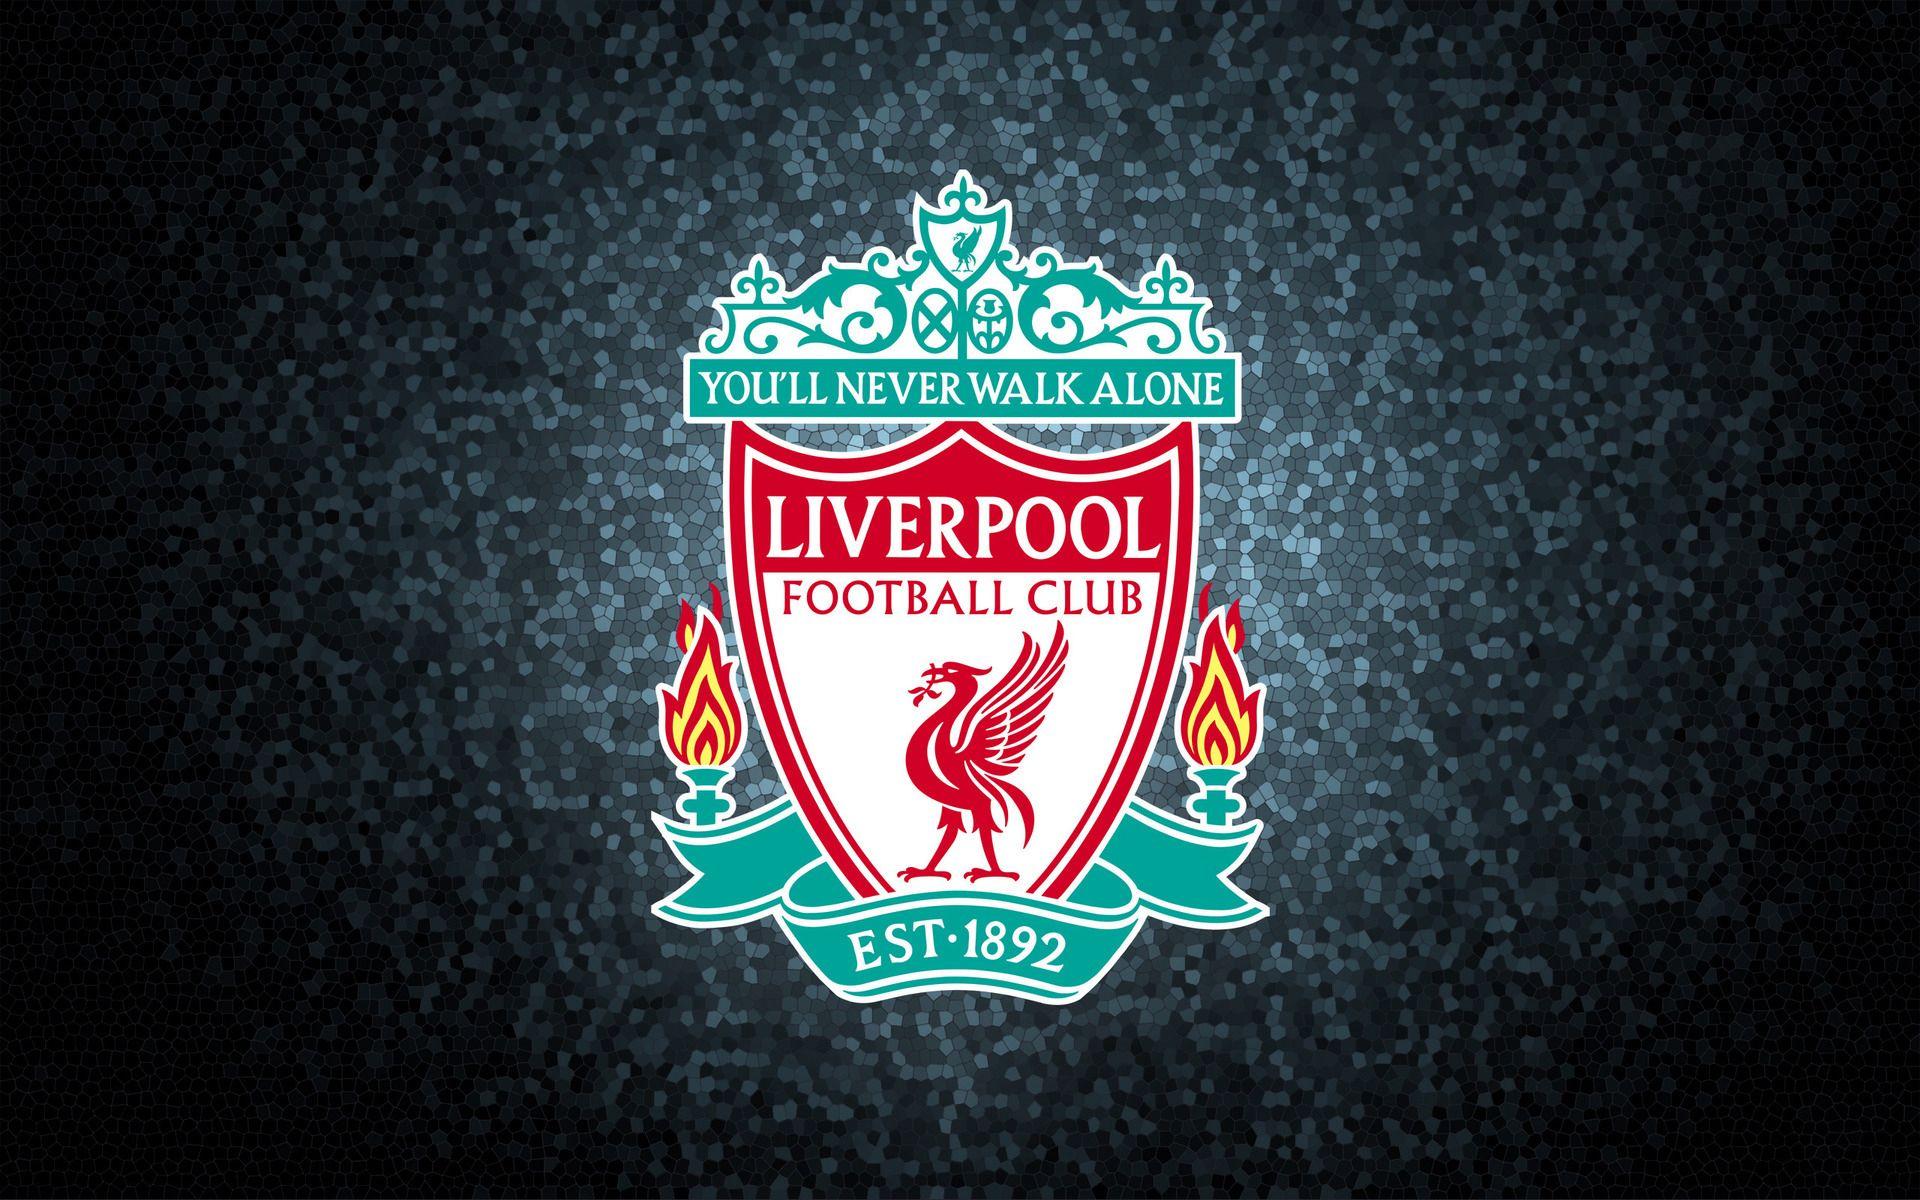 Liverpool Fotball Club Logo wallpaper 1920x1200